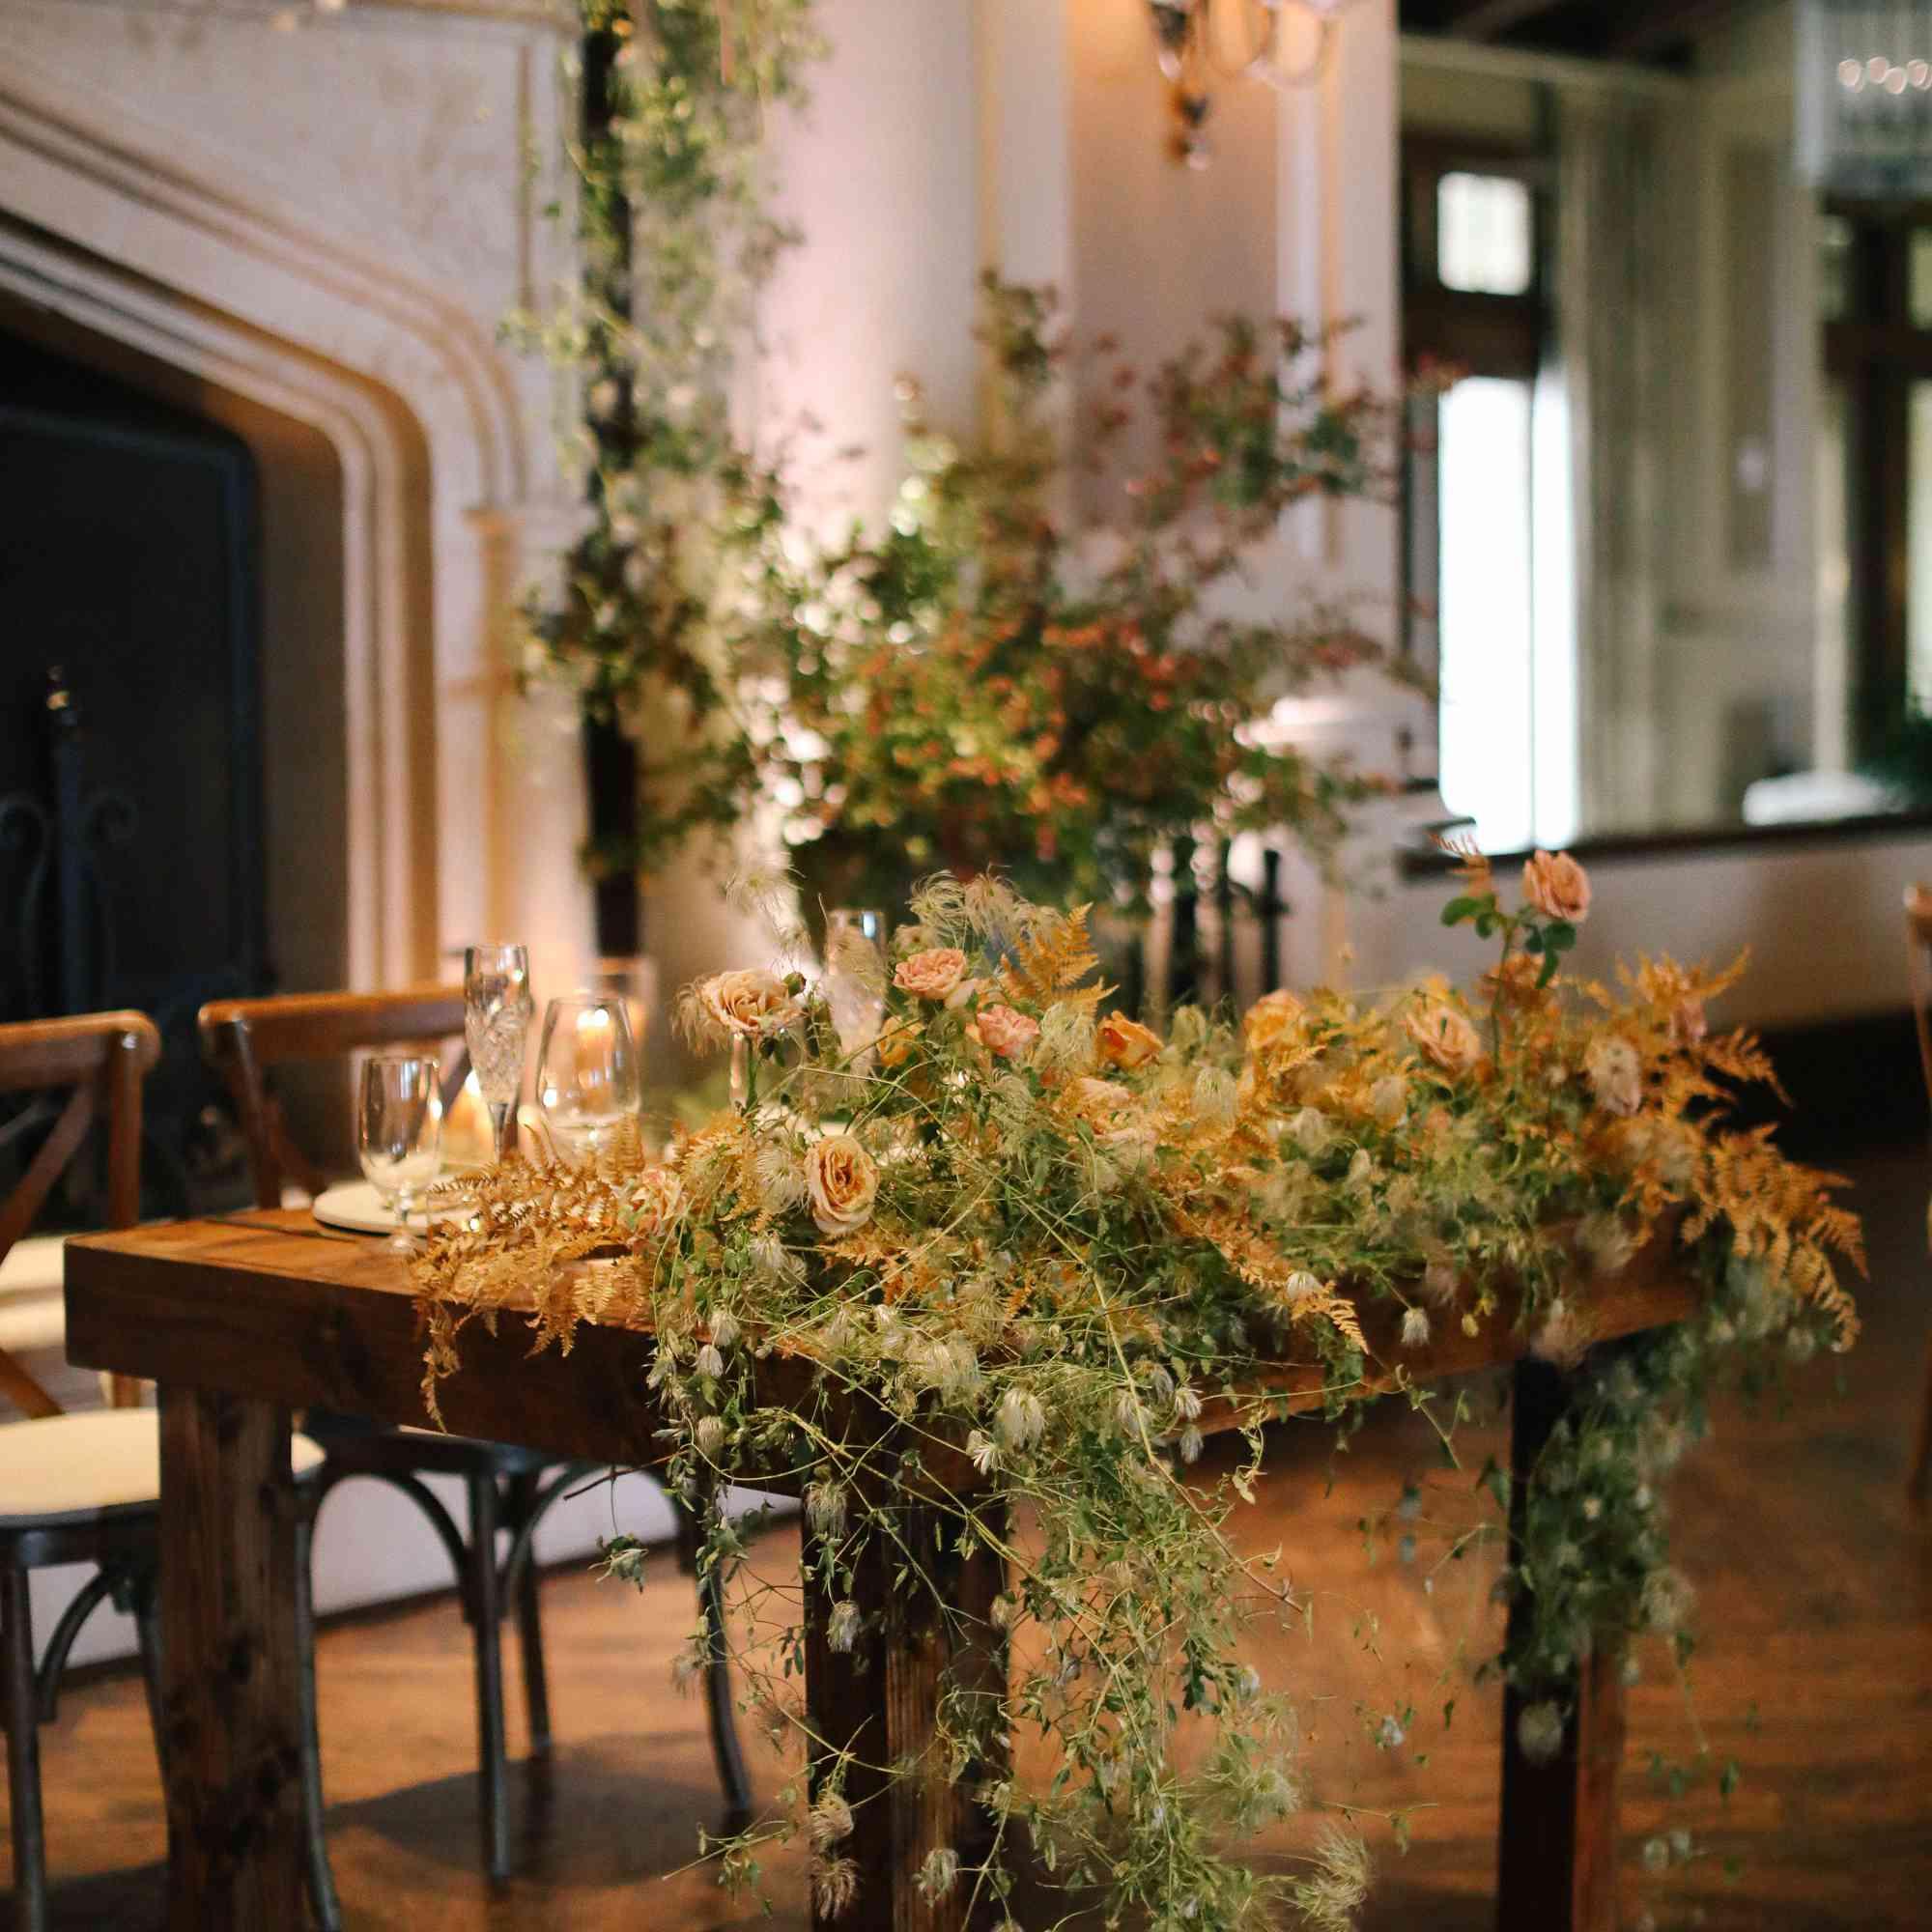 savannah and riker wedding, sweetheart table